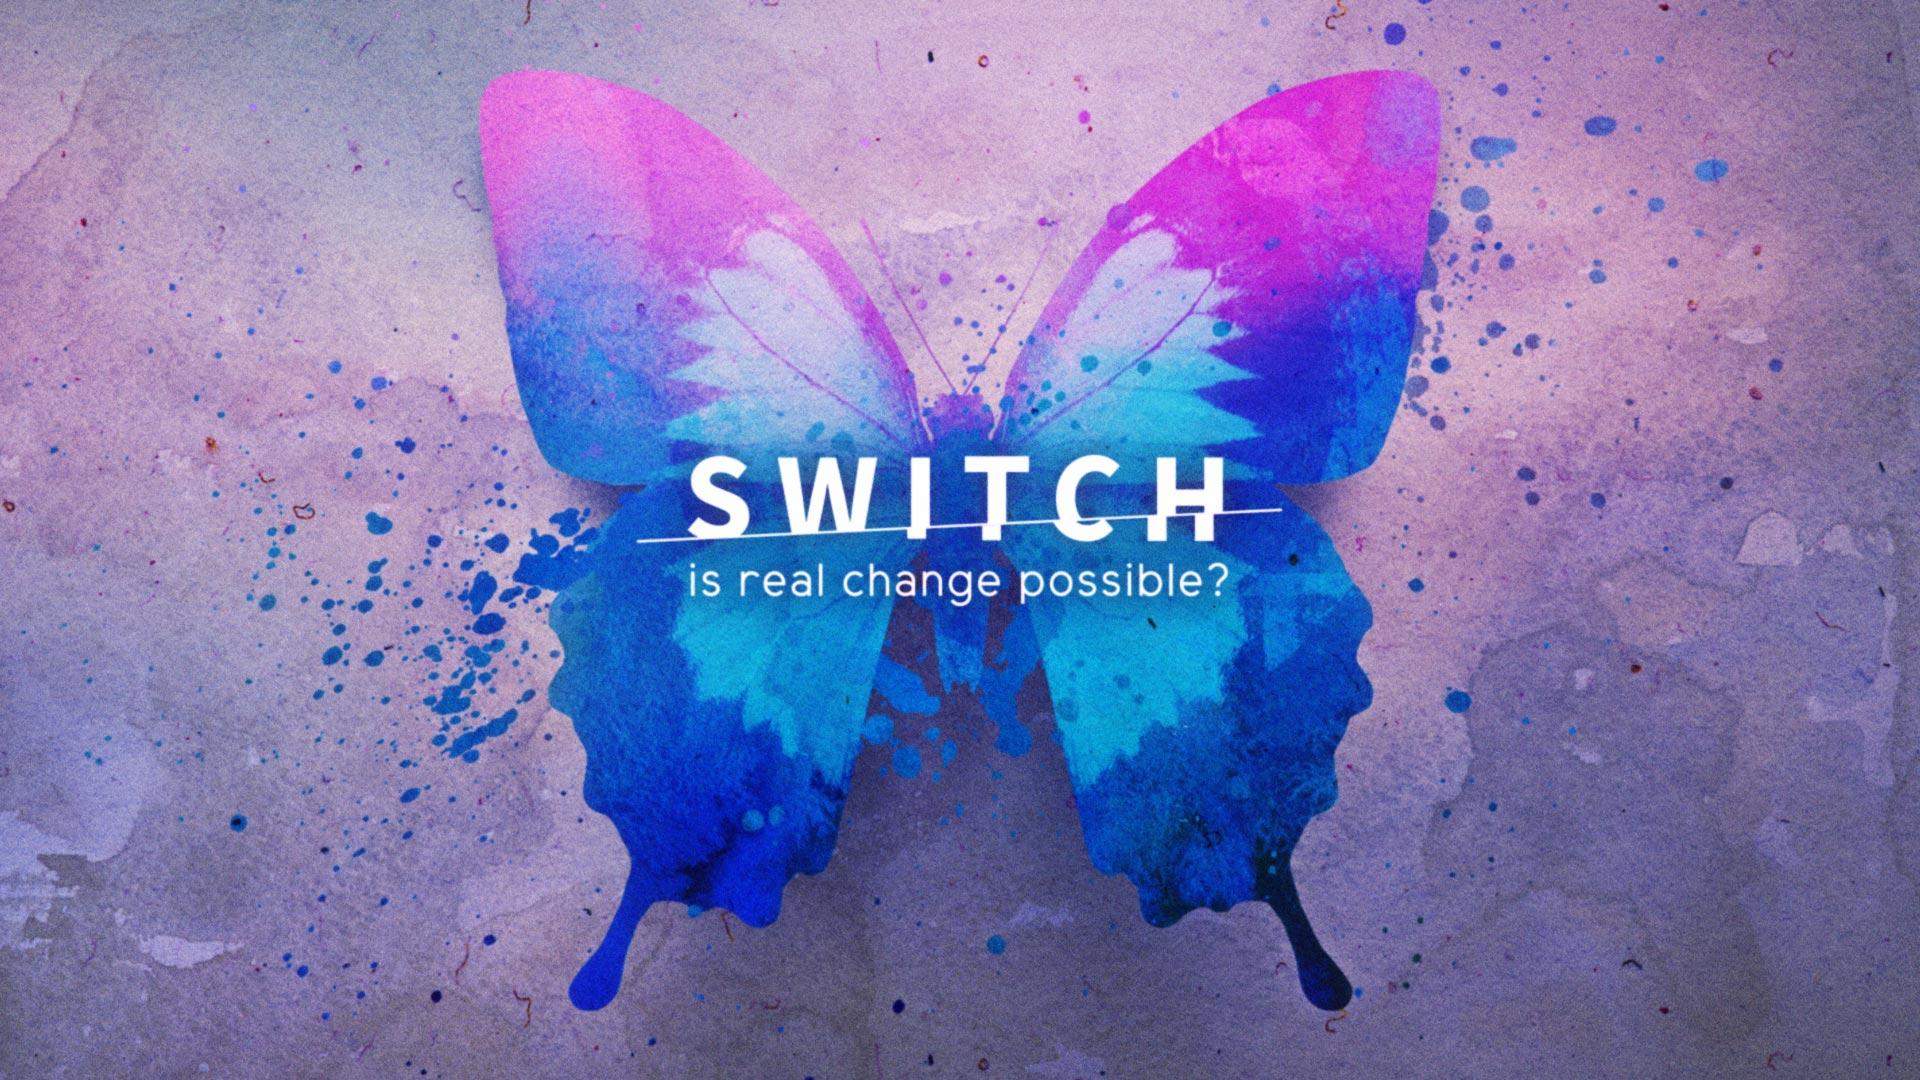 switch_main_title.jpg